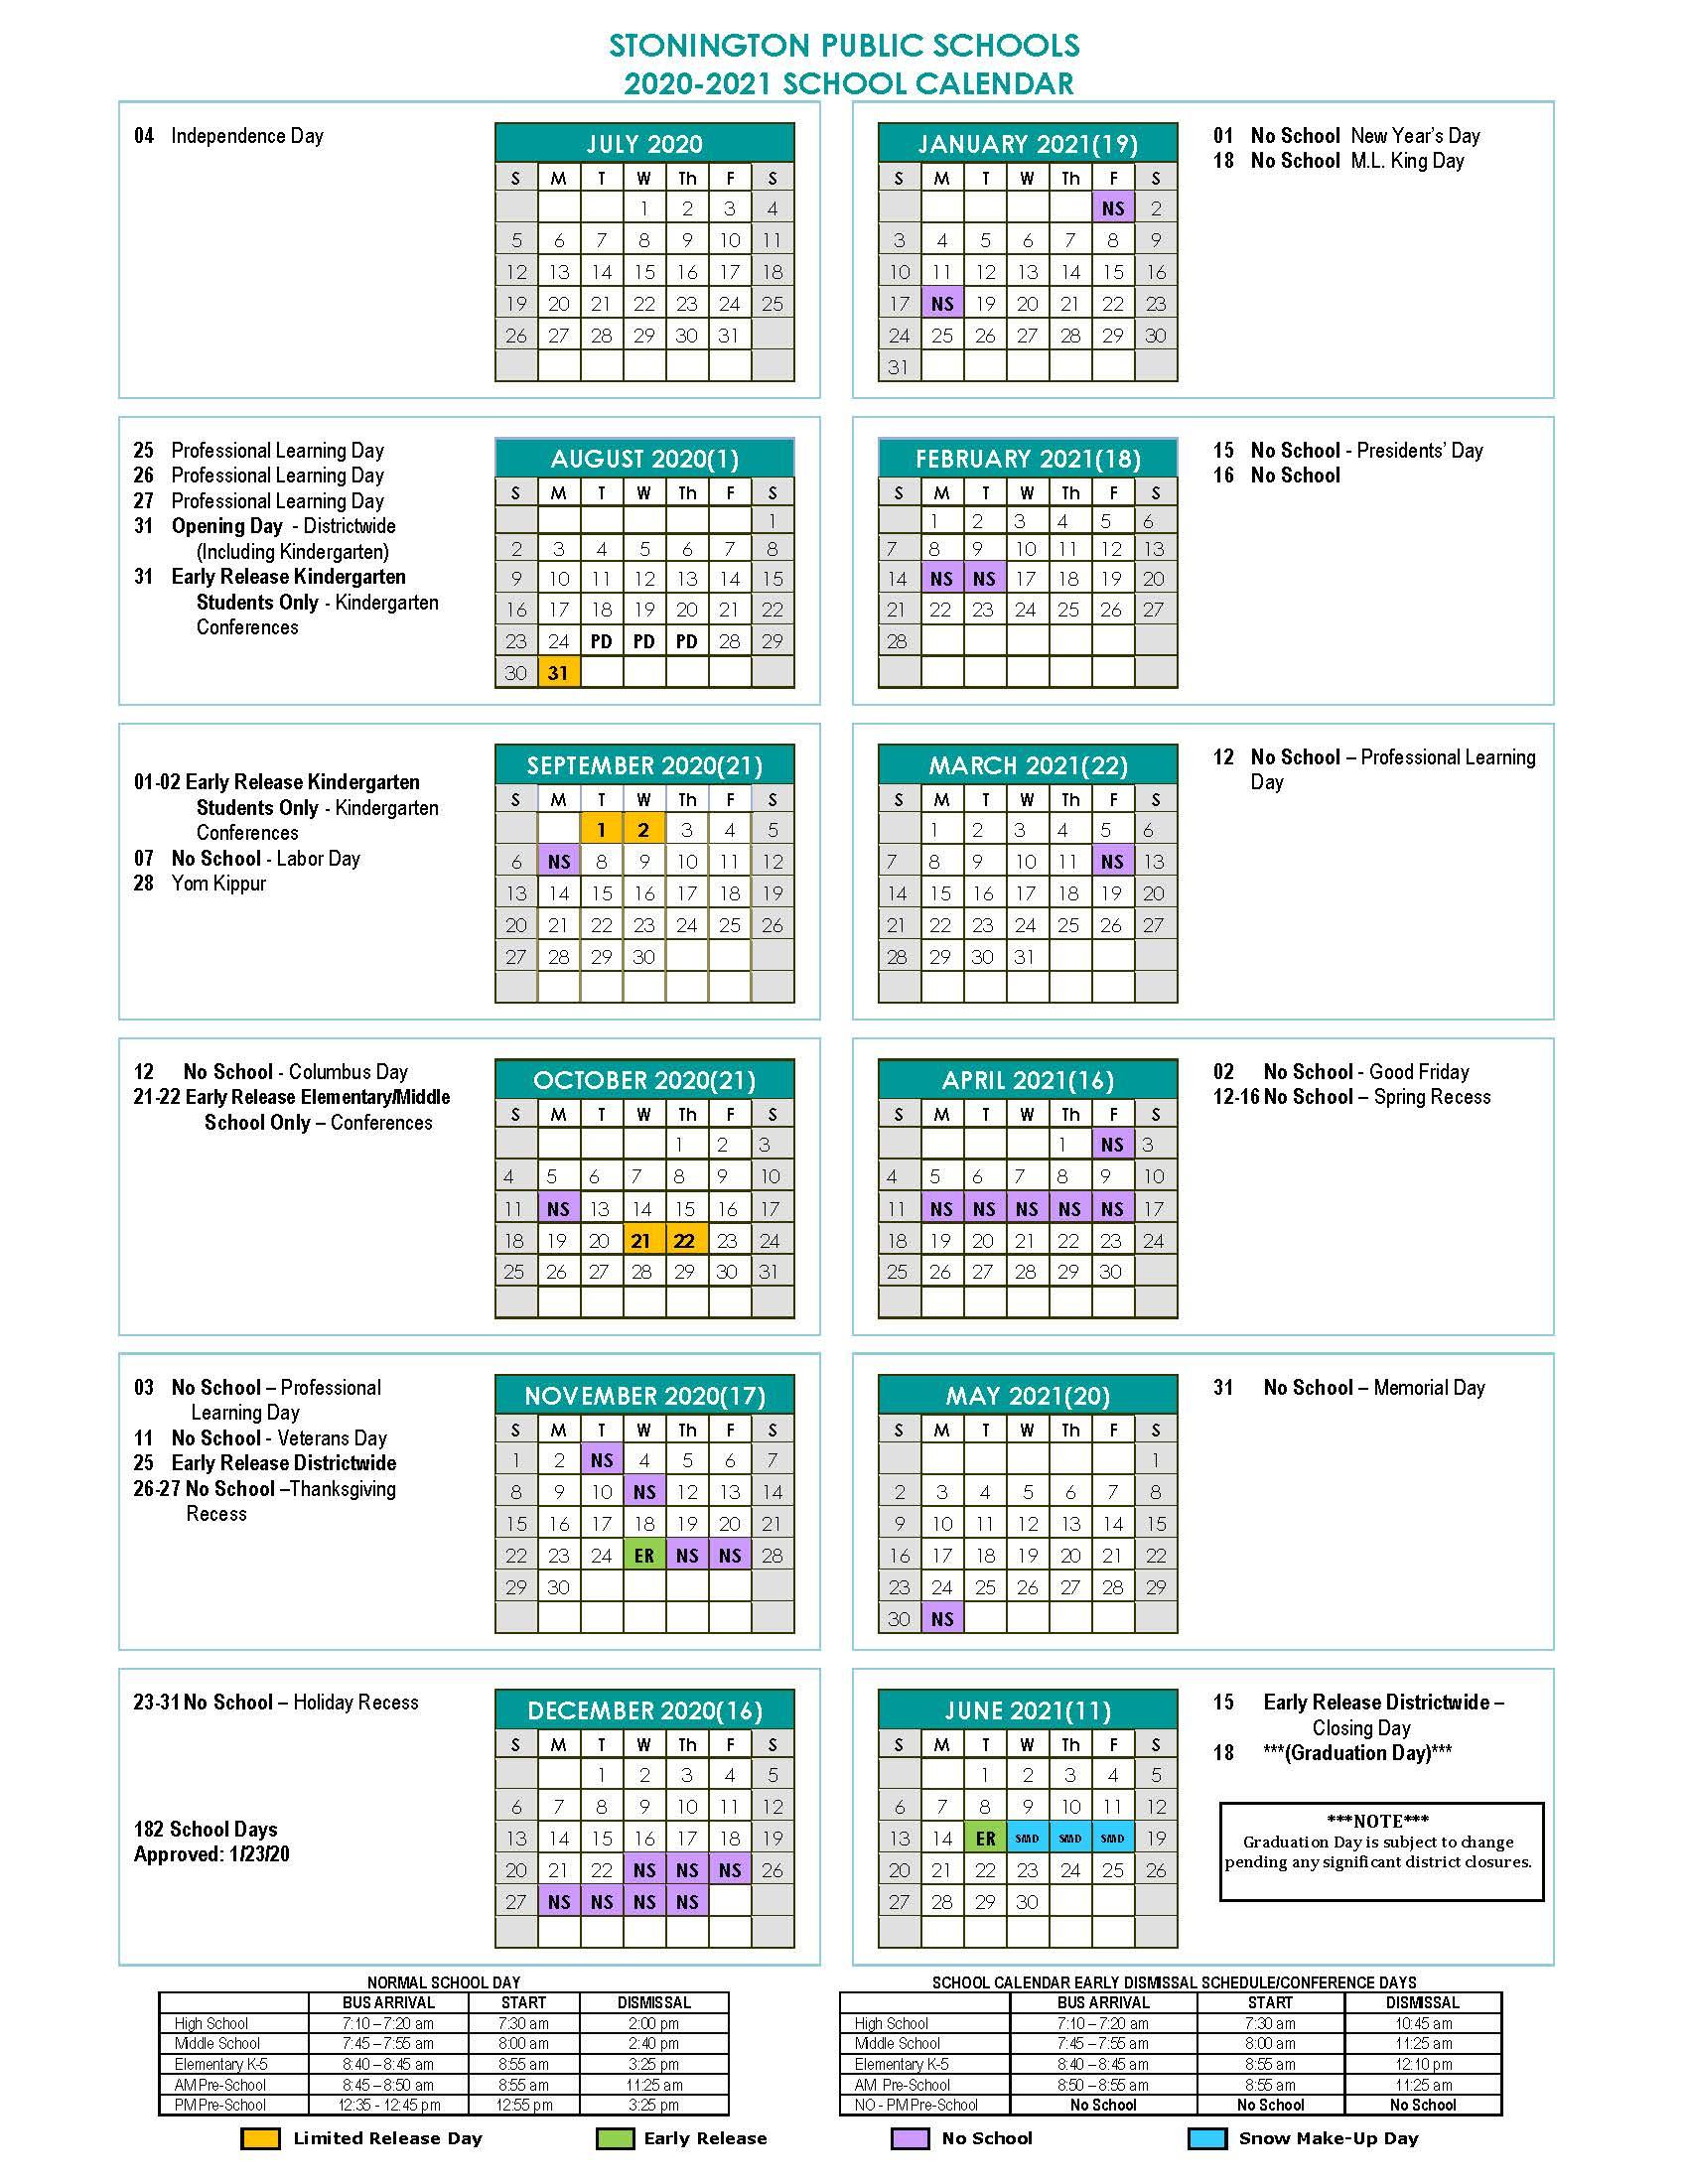 Stonington Public Schools Calendar 2020 And 2021 Throughout Las Cruces Public School Calendar 2021 20